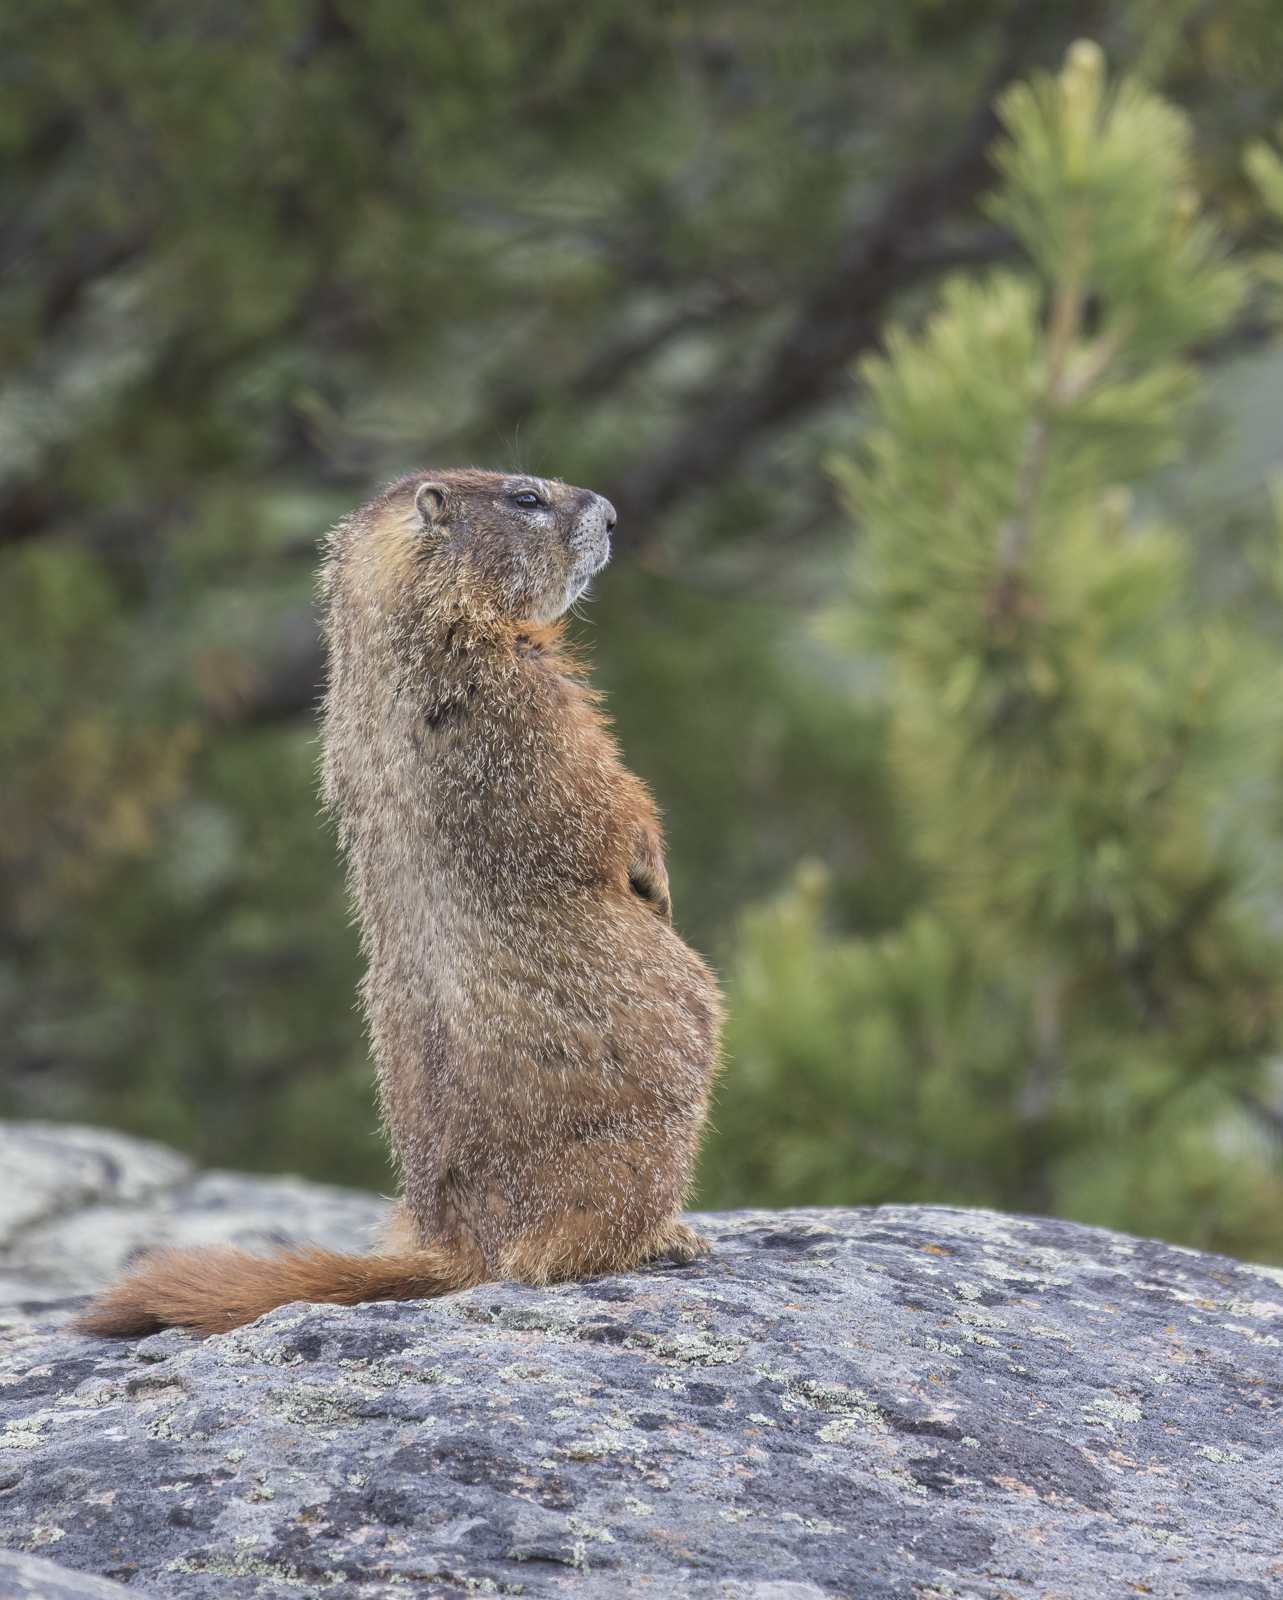 Yellow-bellied marmot watching fox